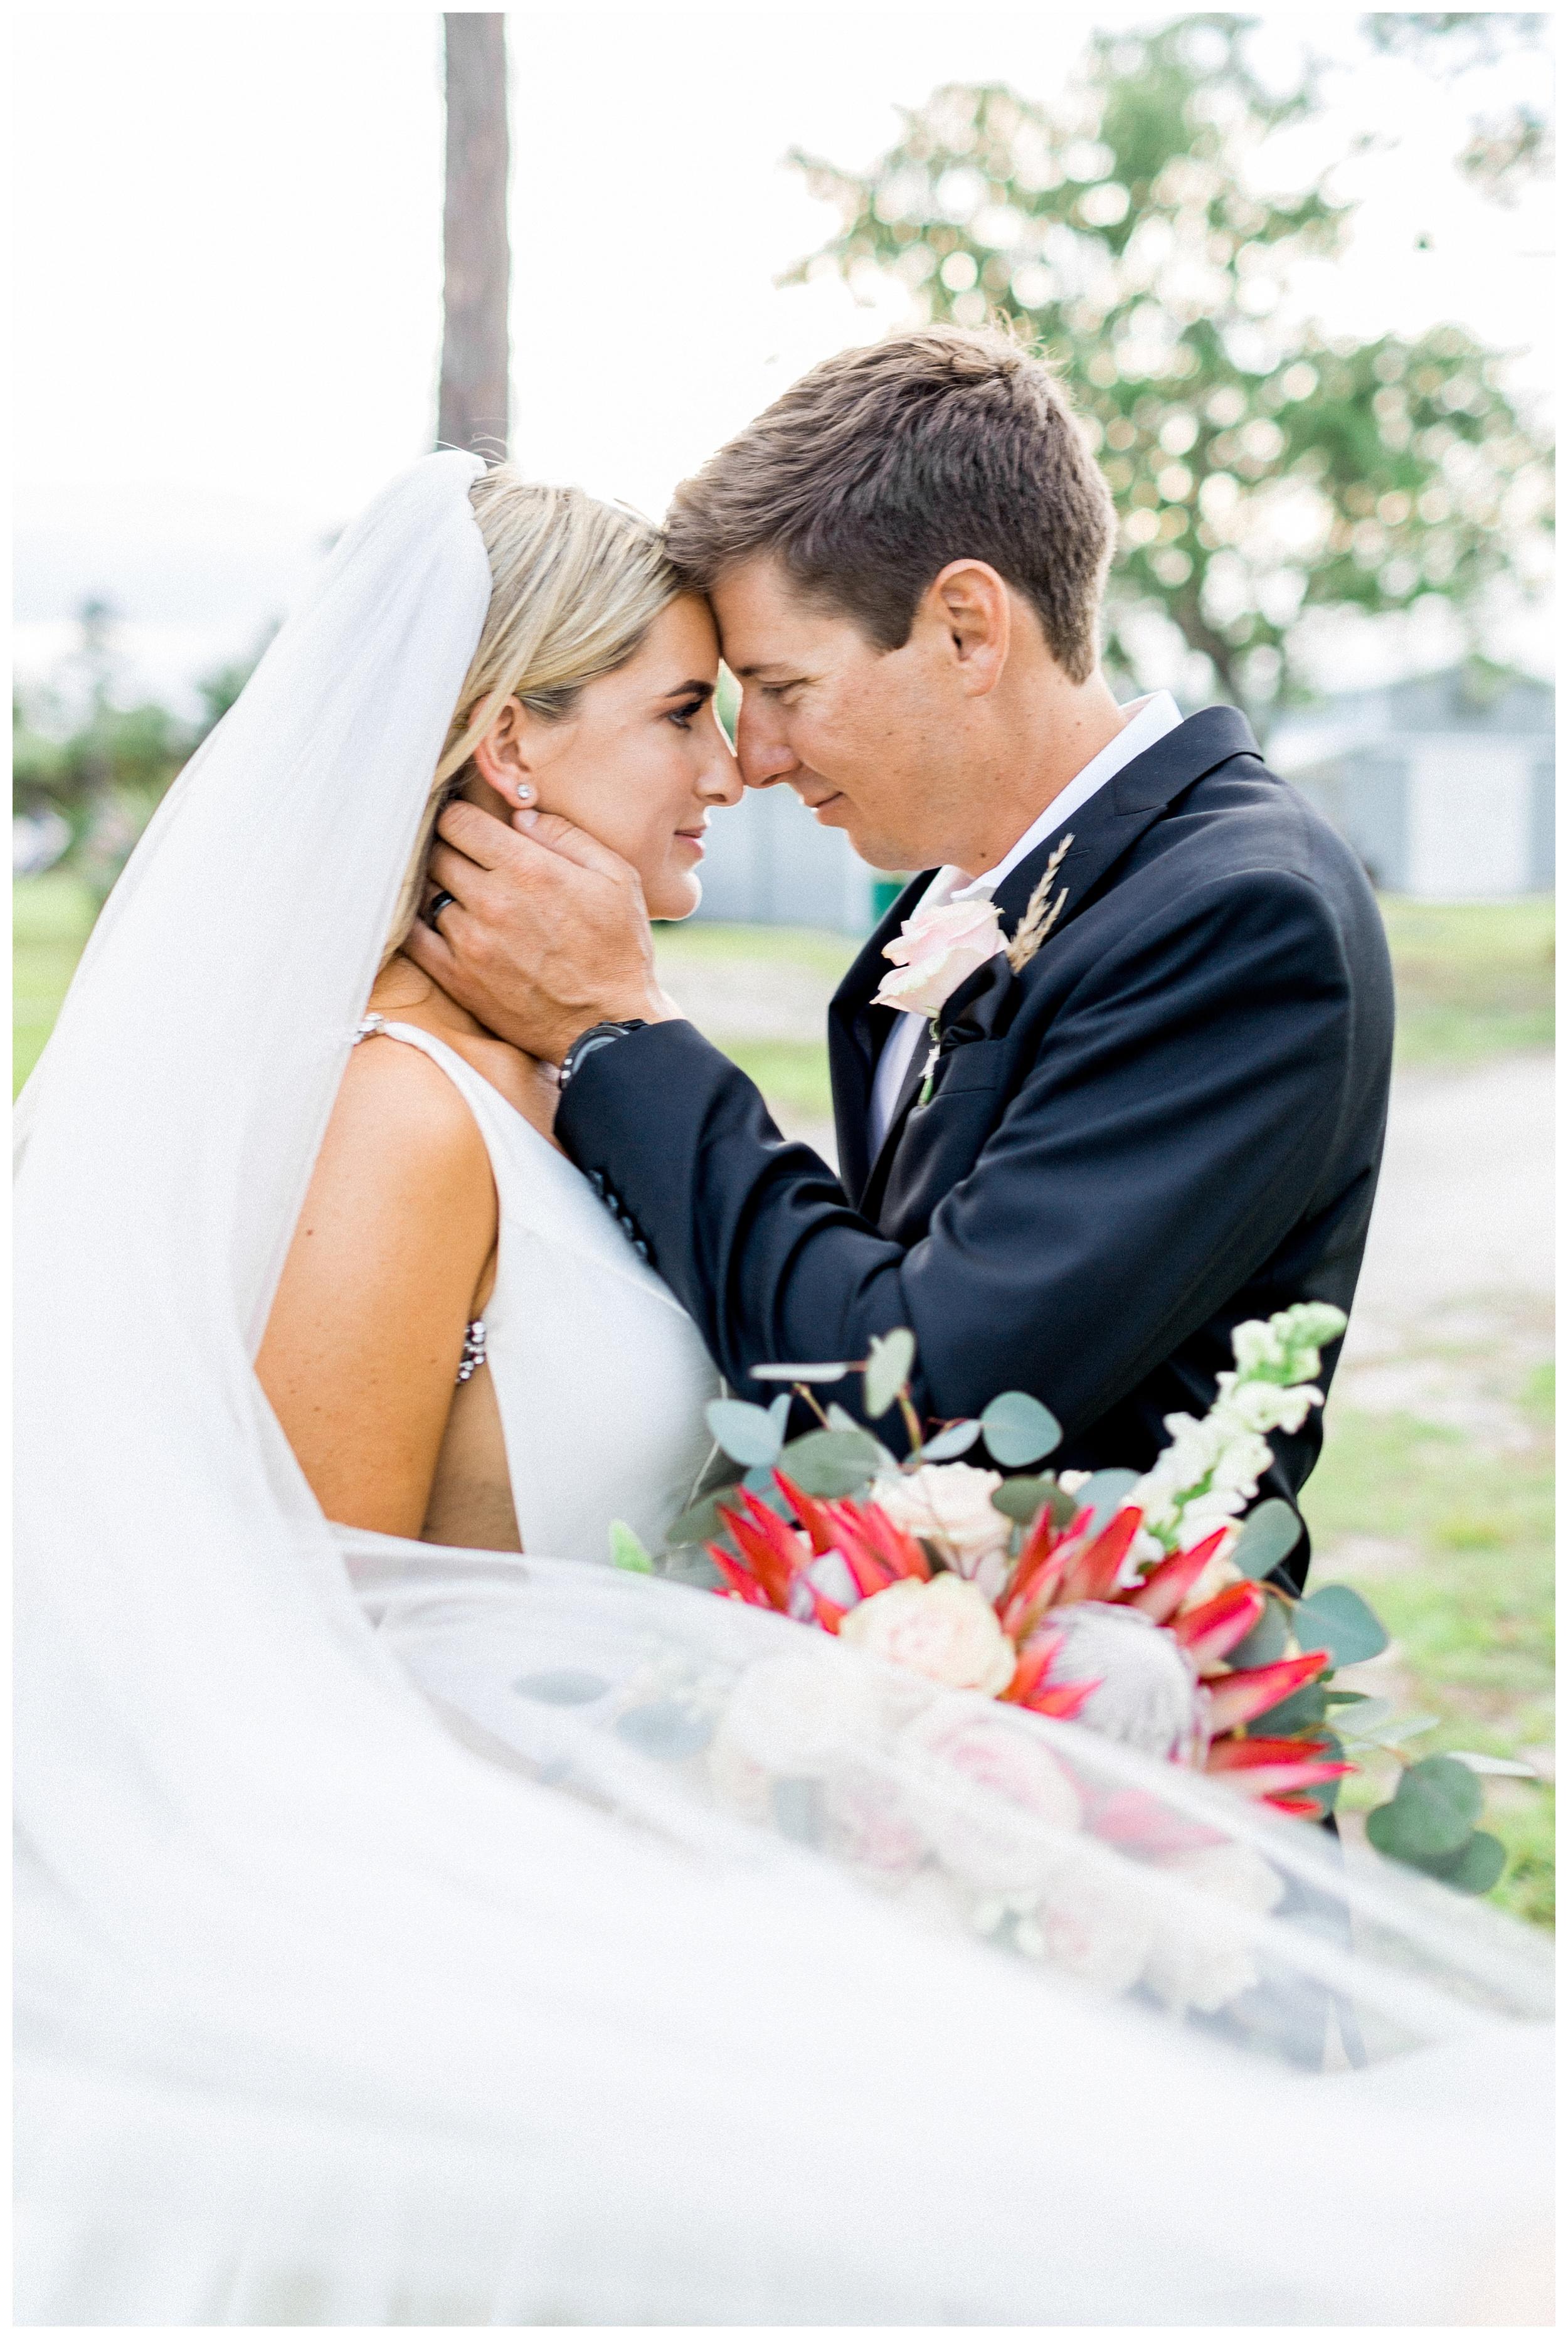 South Florida Wedding Photographer Kir Tuben_0090.jpg